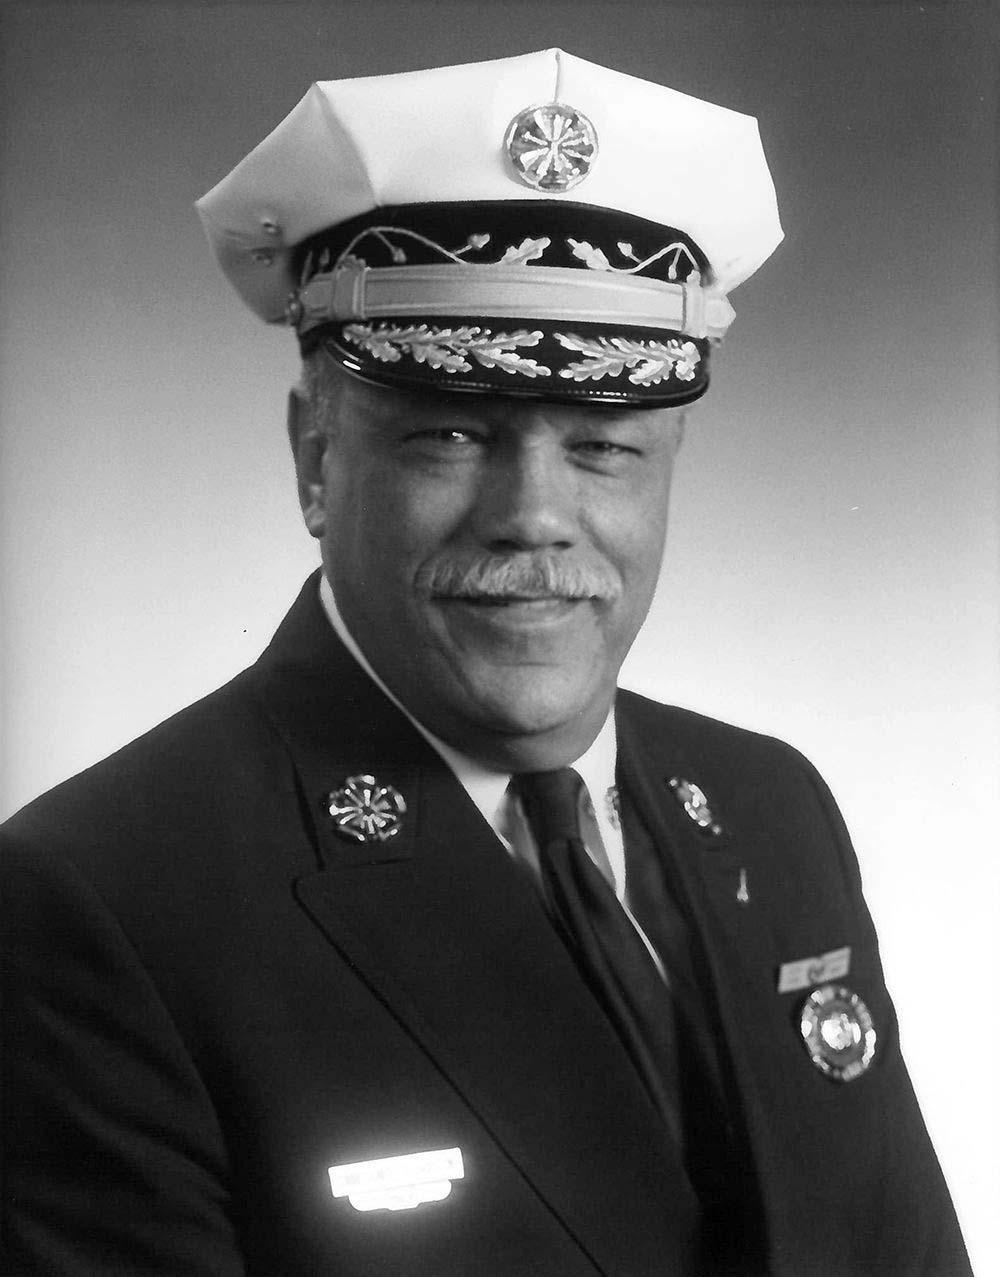 Philadelphia Fire Commissioner Harold Hairston